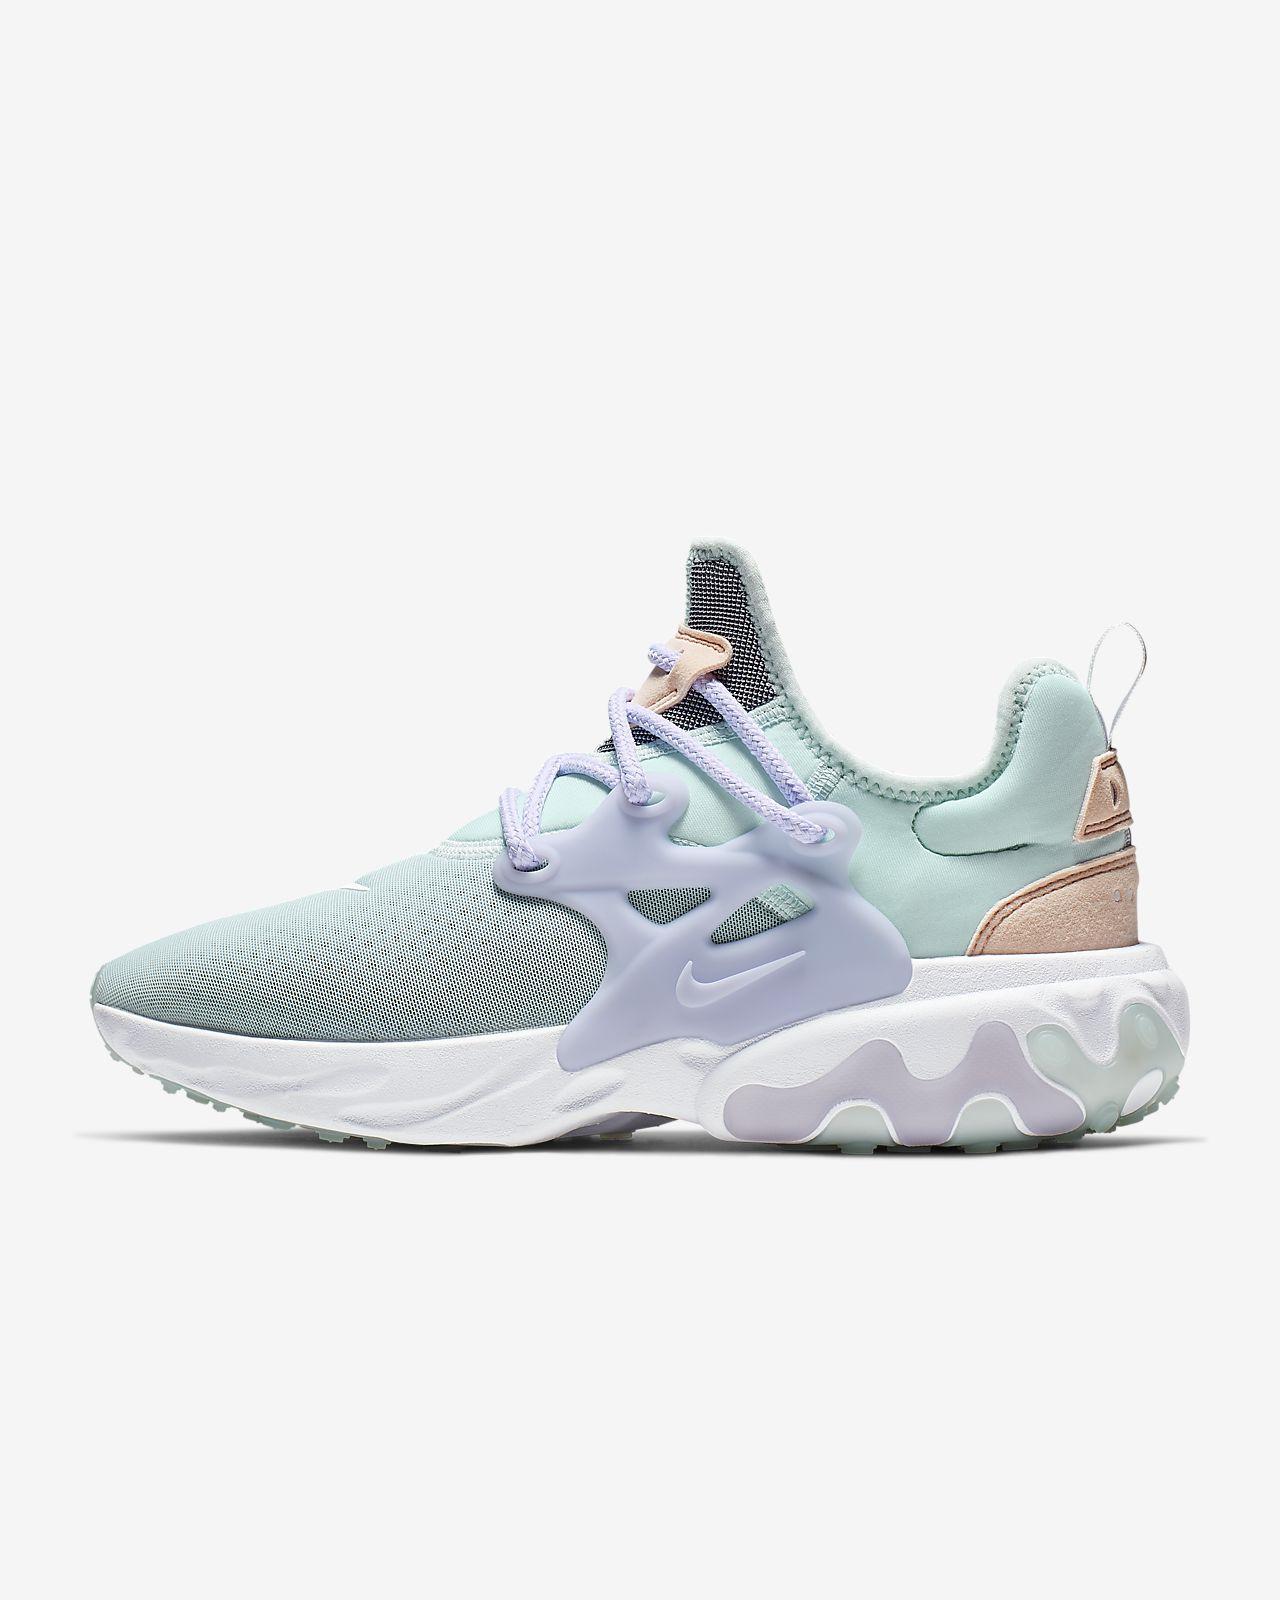 50% price sleek promo code Nike React Presto Women's Shoe